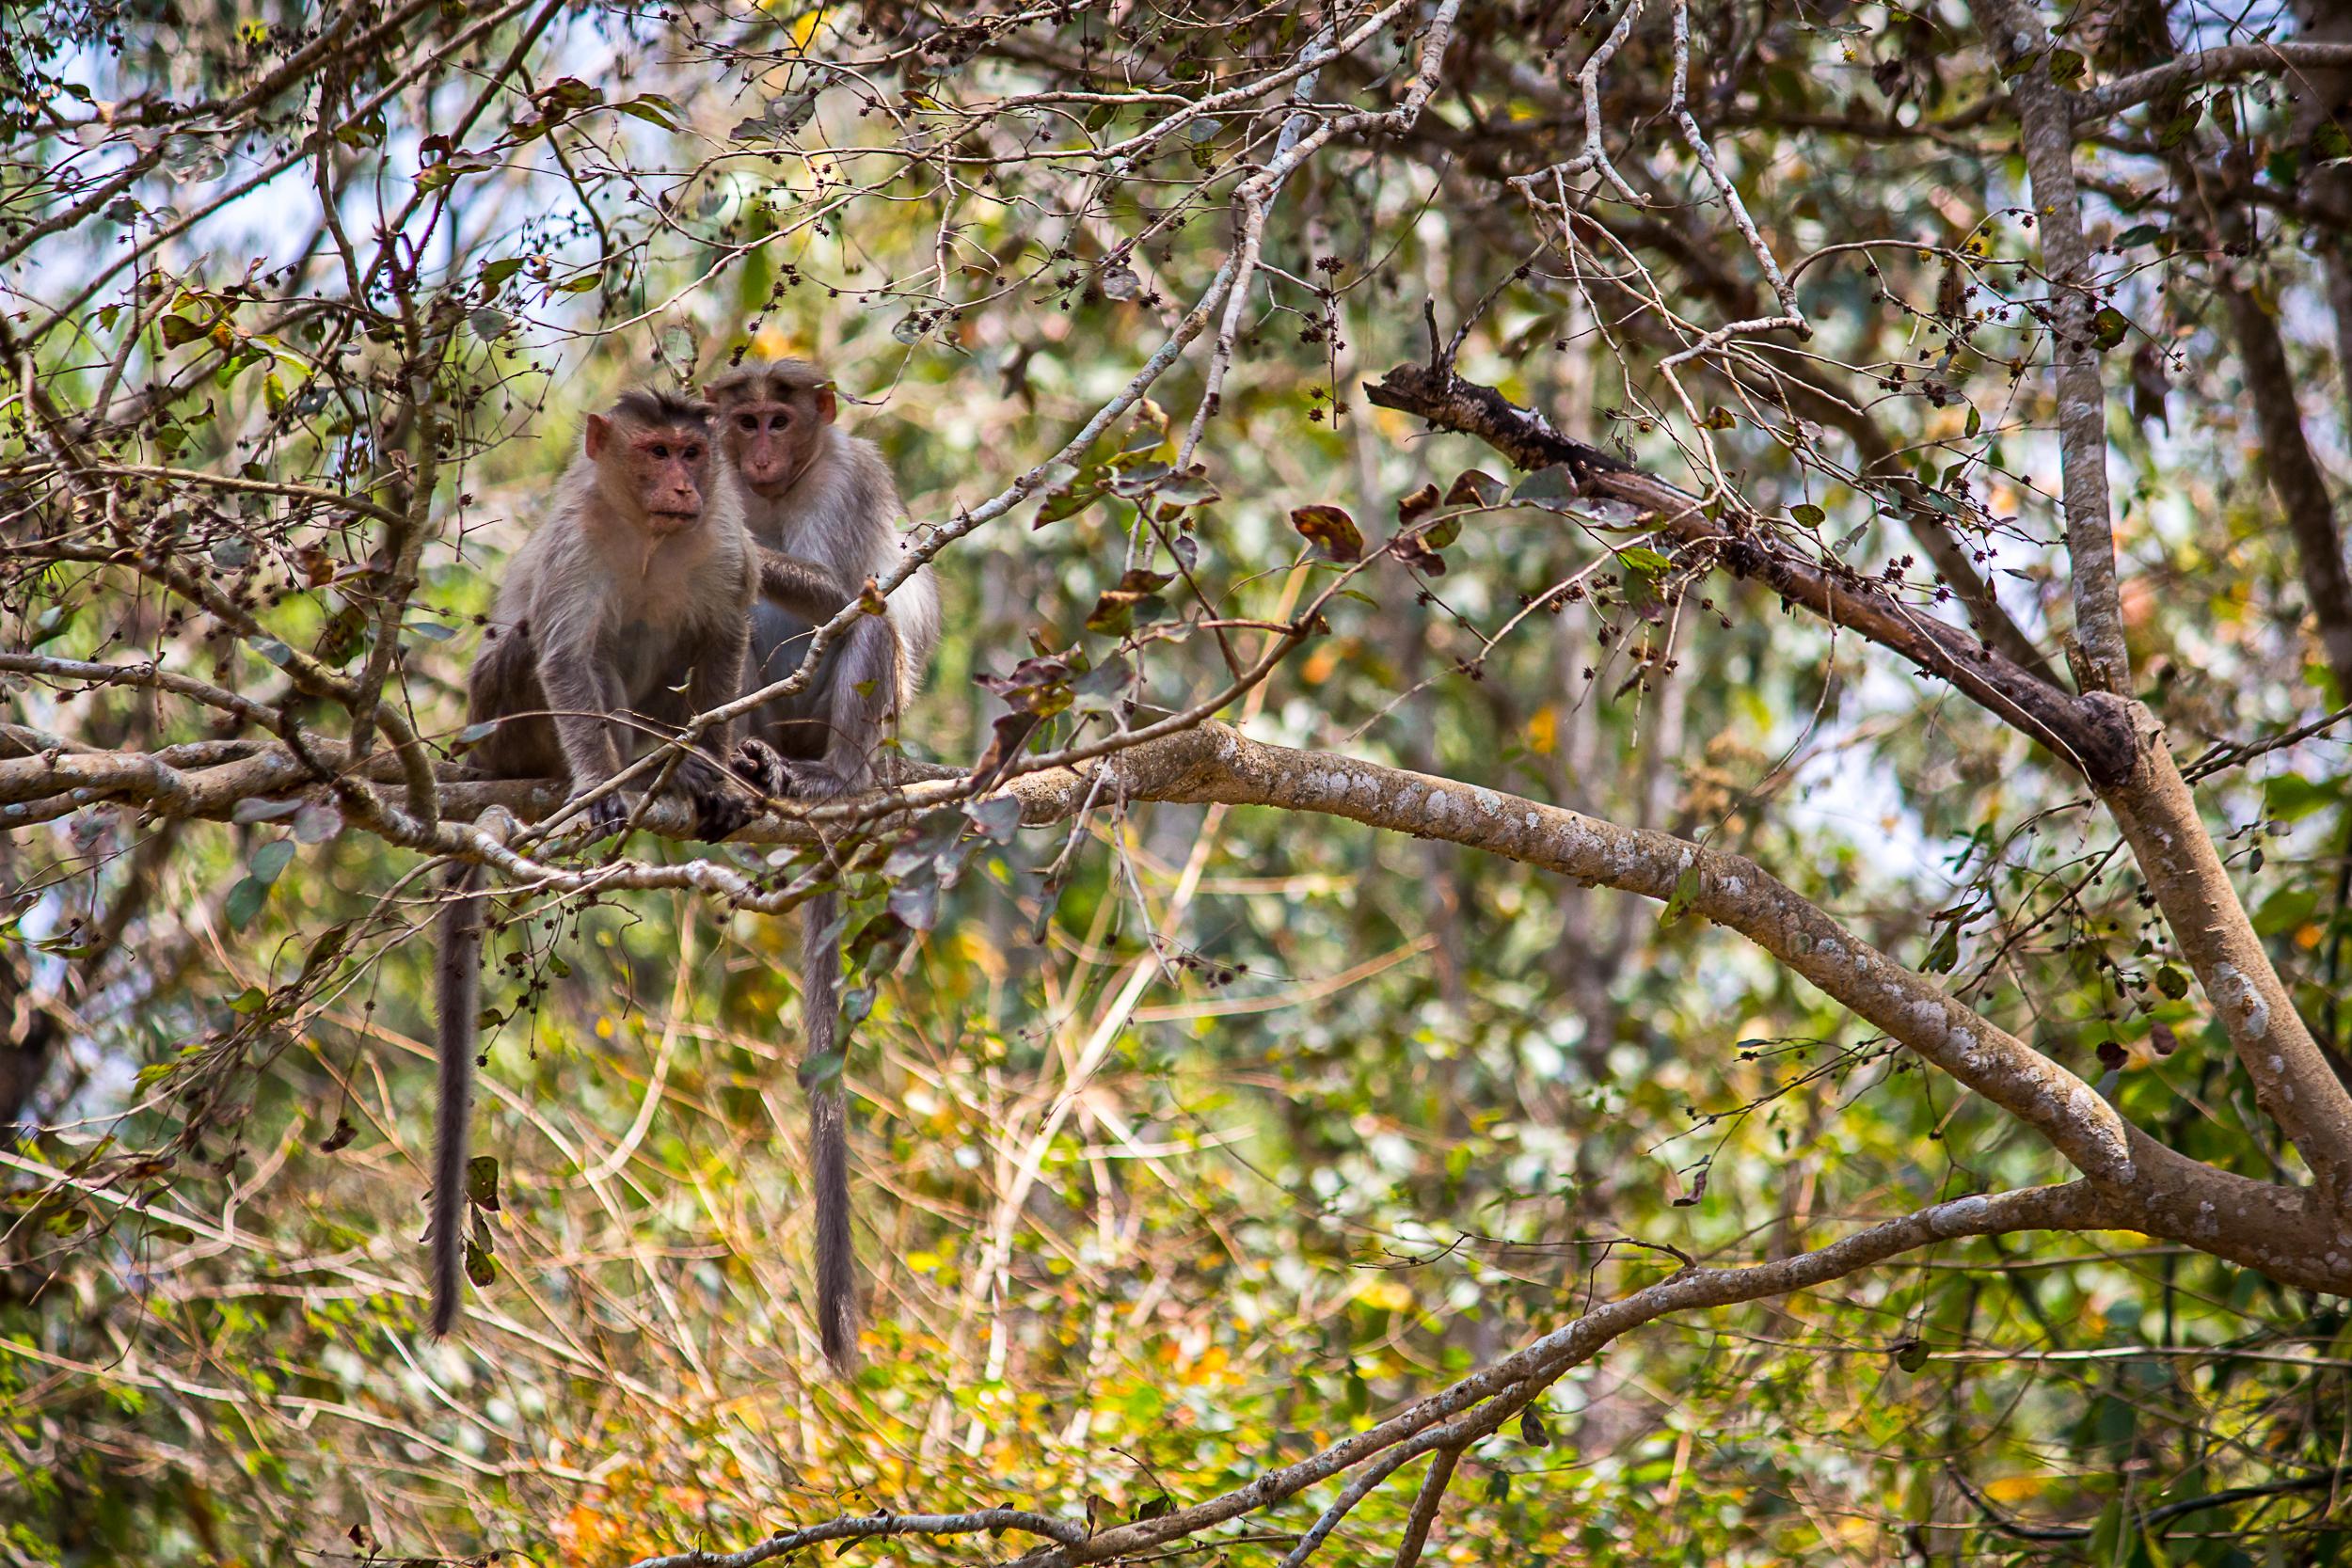 Monkeys sitting on tree branches